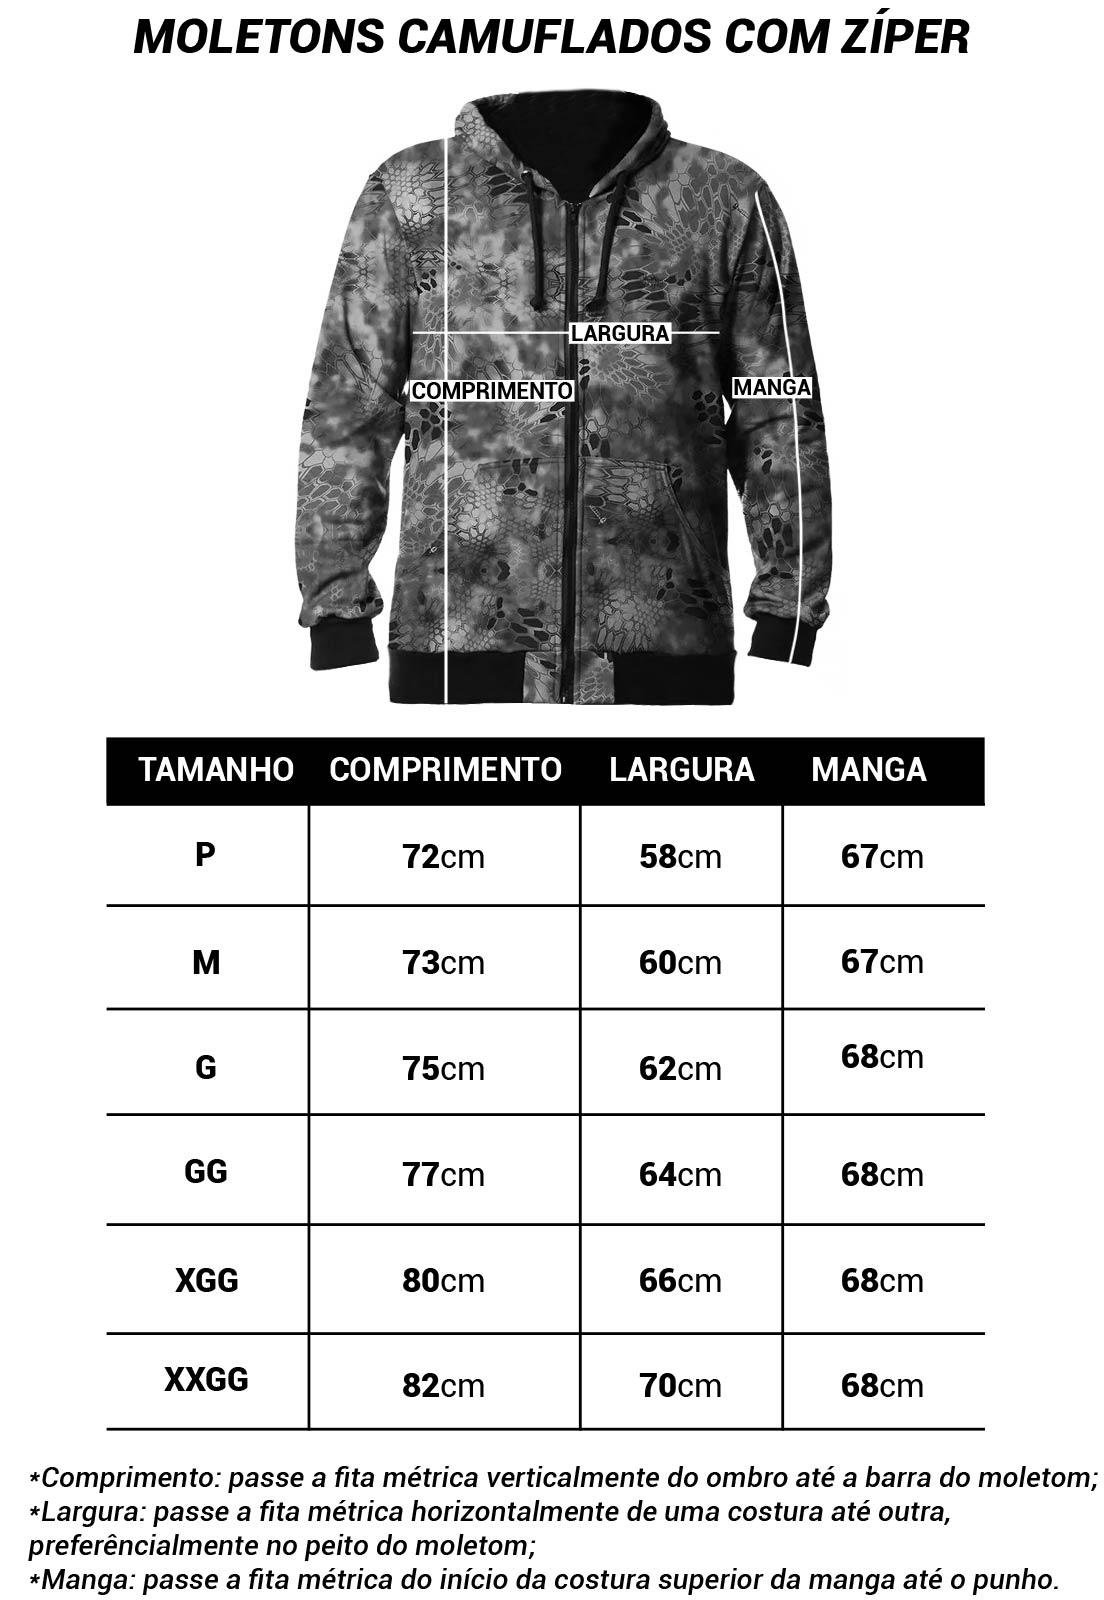 MOLETOM CAMUFLADO AMAZÔNIA MASCULINO ABERTO  - REAL HUNTER OUTDOORS